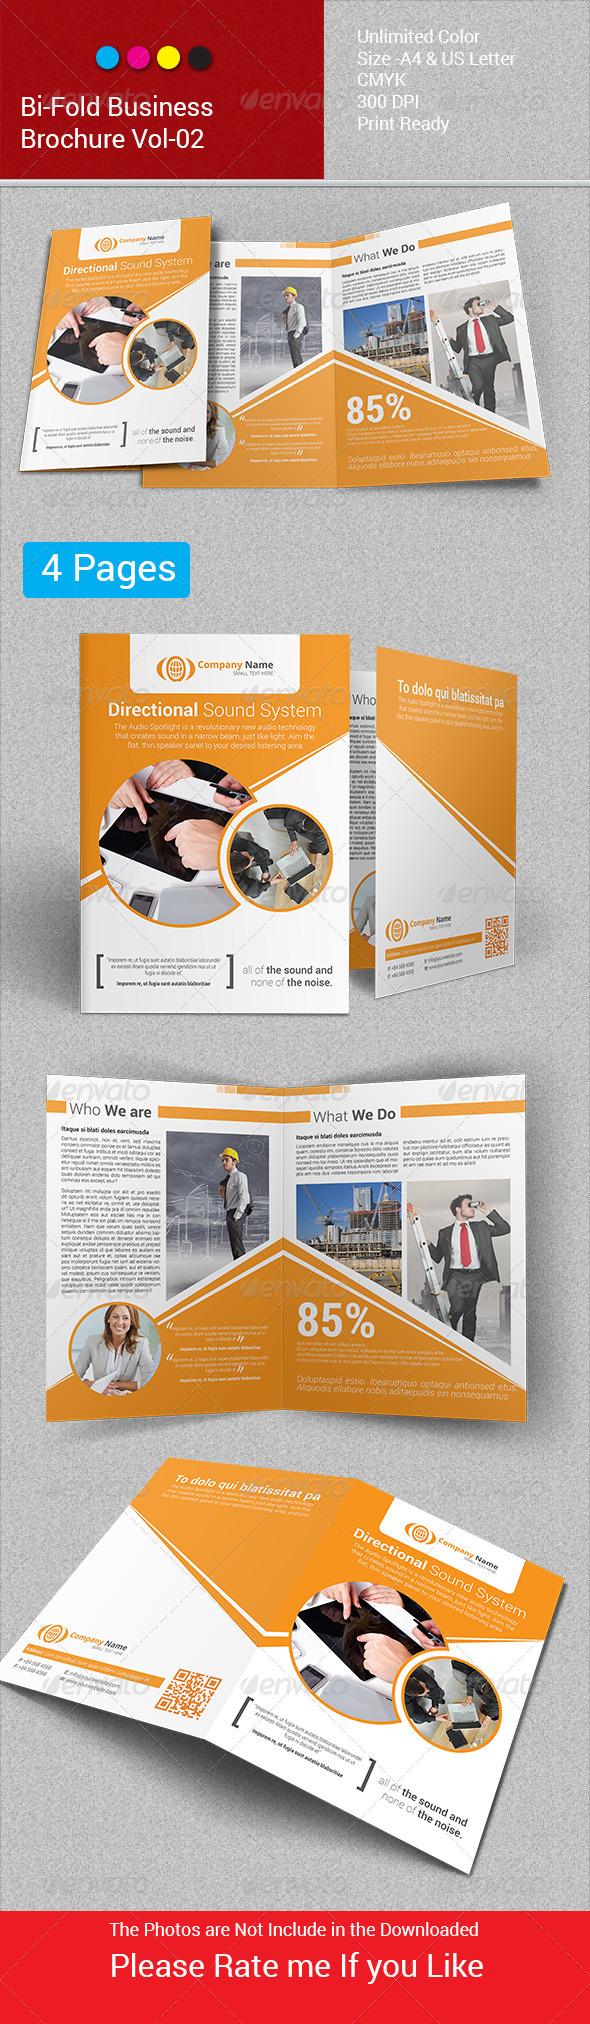 GraphicRiver Bi-Fold Business Brochure Vol-02 6583181